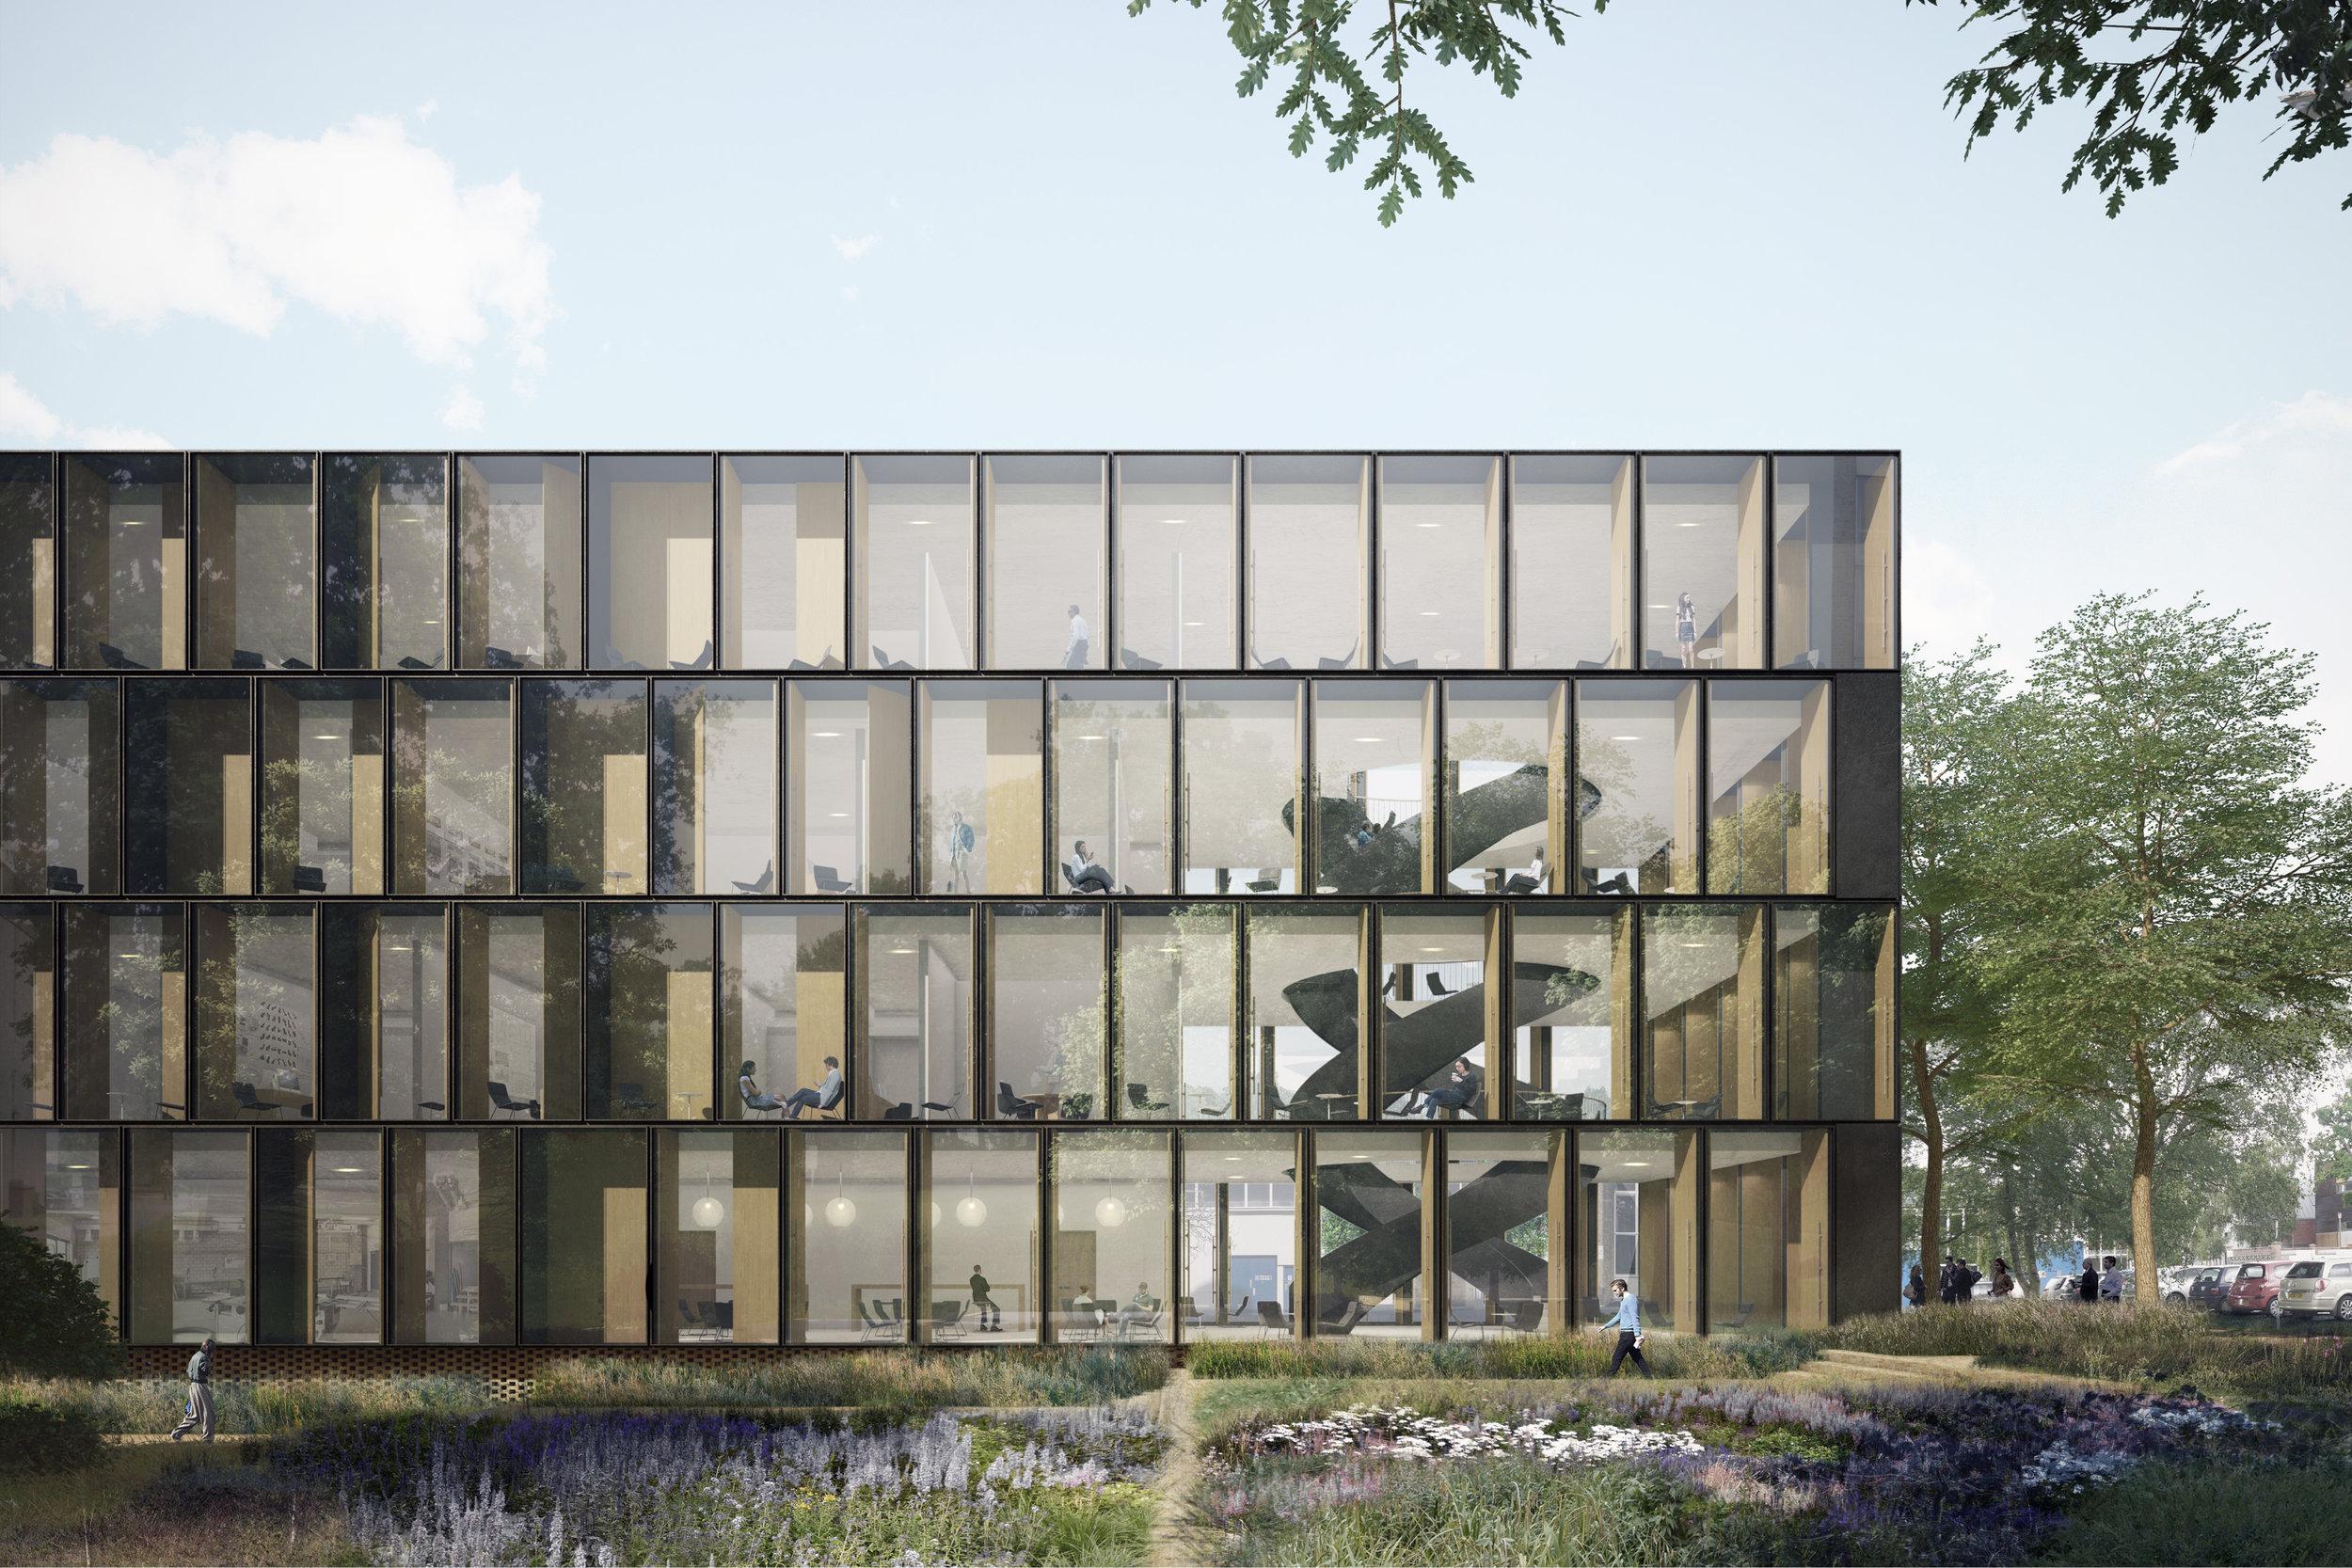 Render of Open Innovation Hub for Building Research Establishment (BRE)